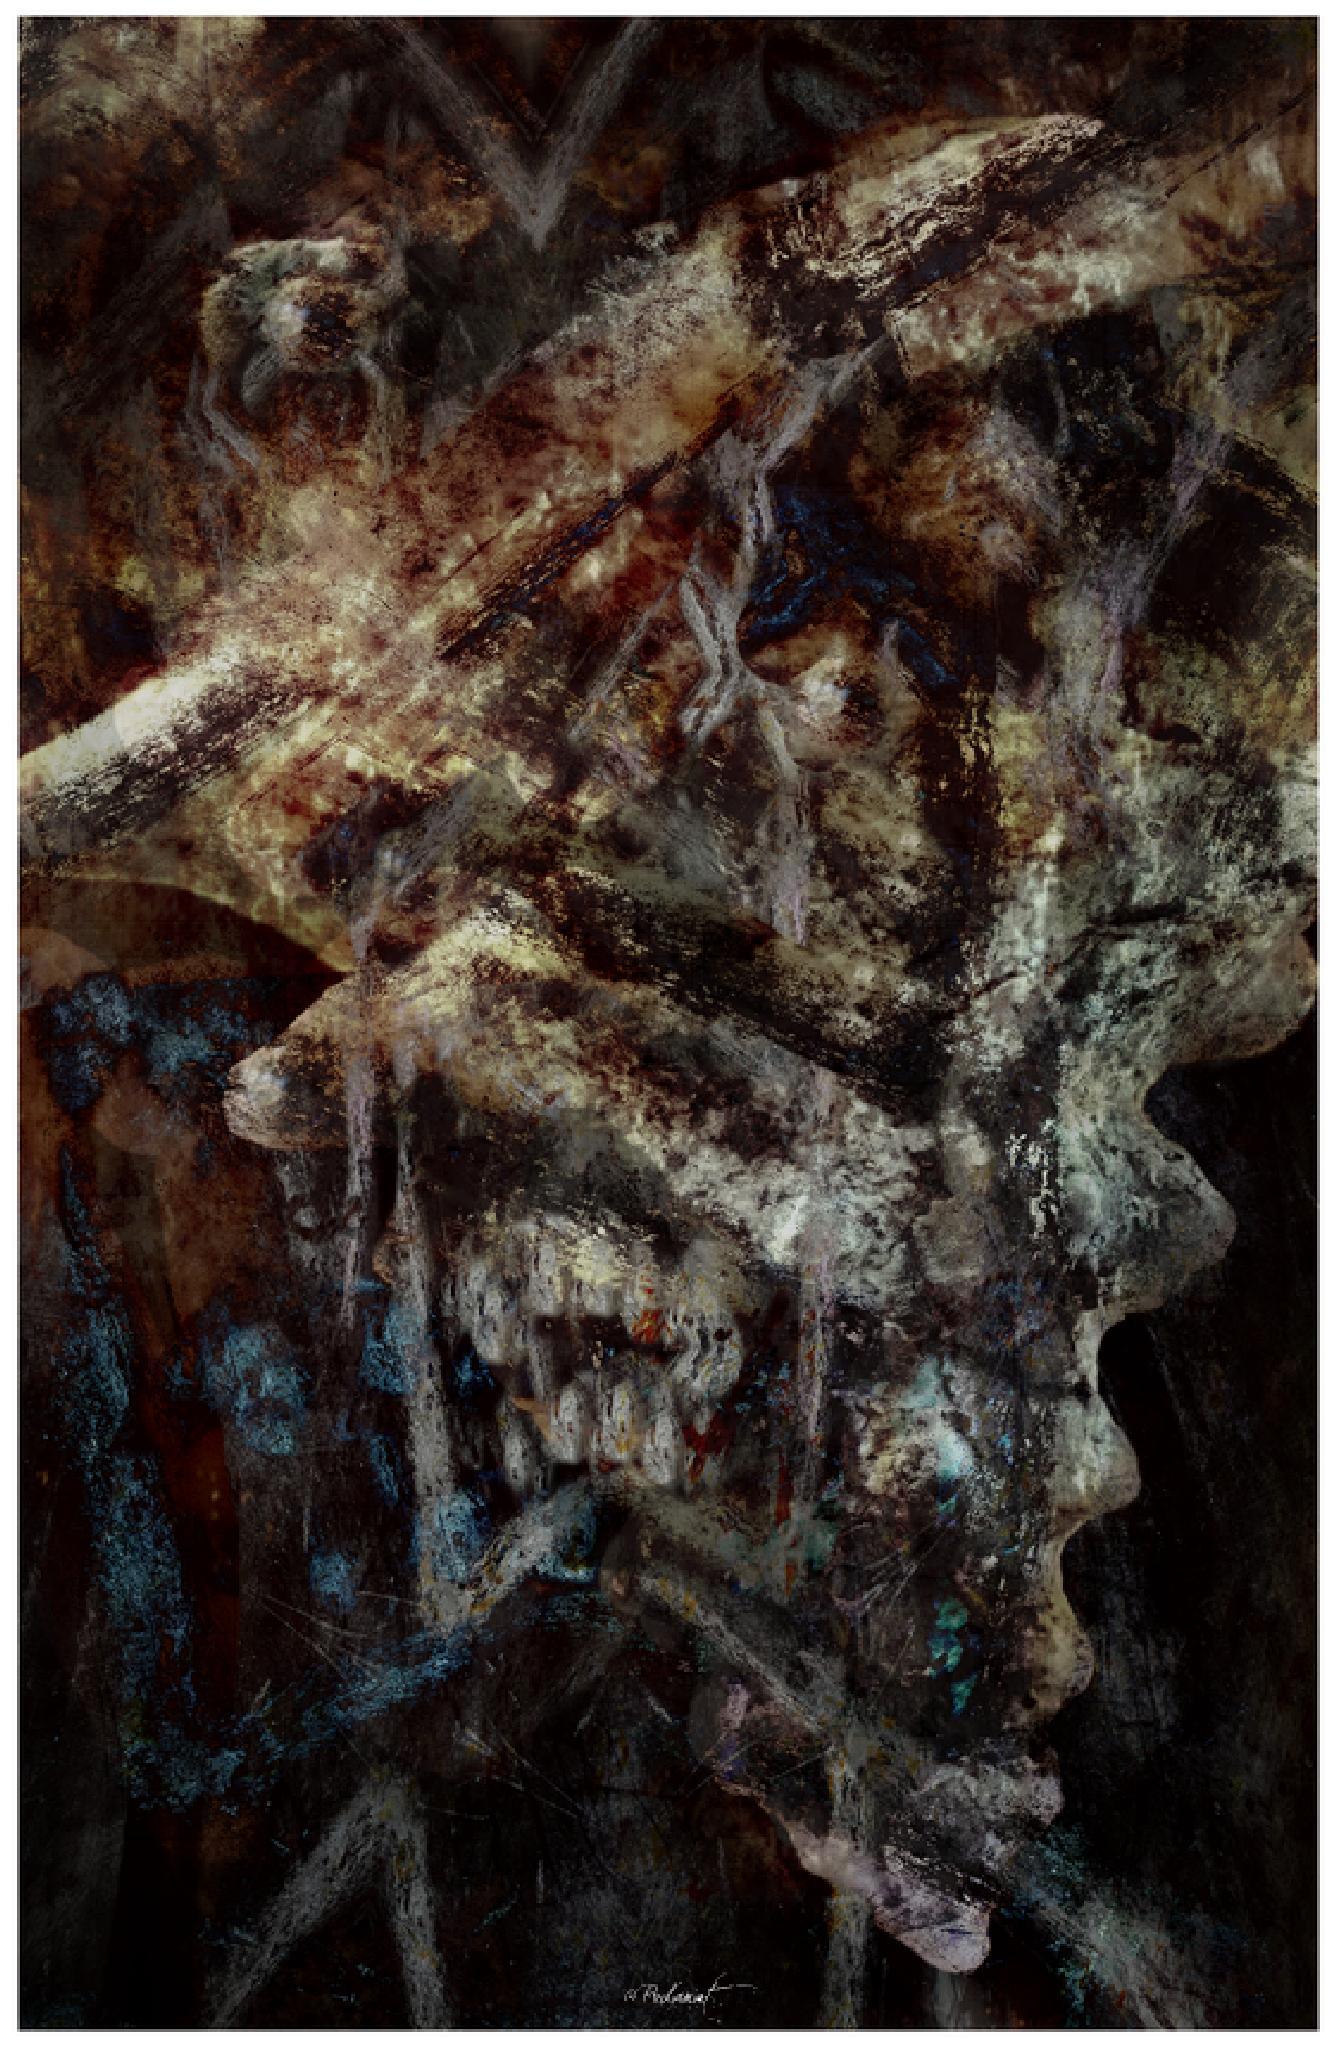 La Morsure ... by Precharmant